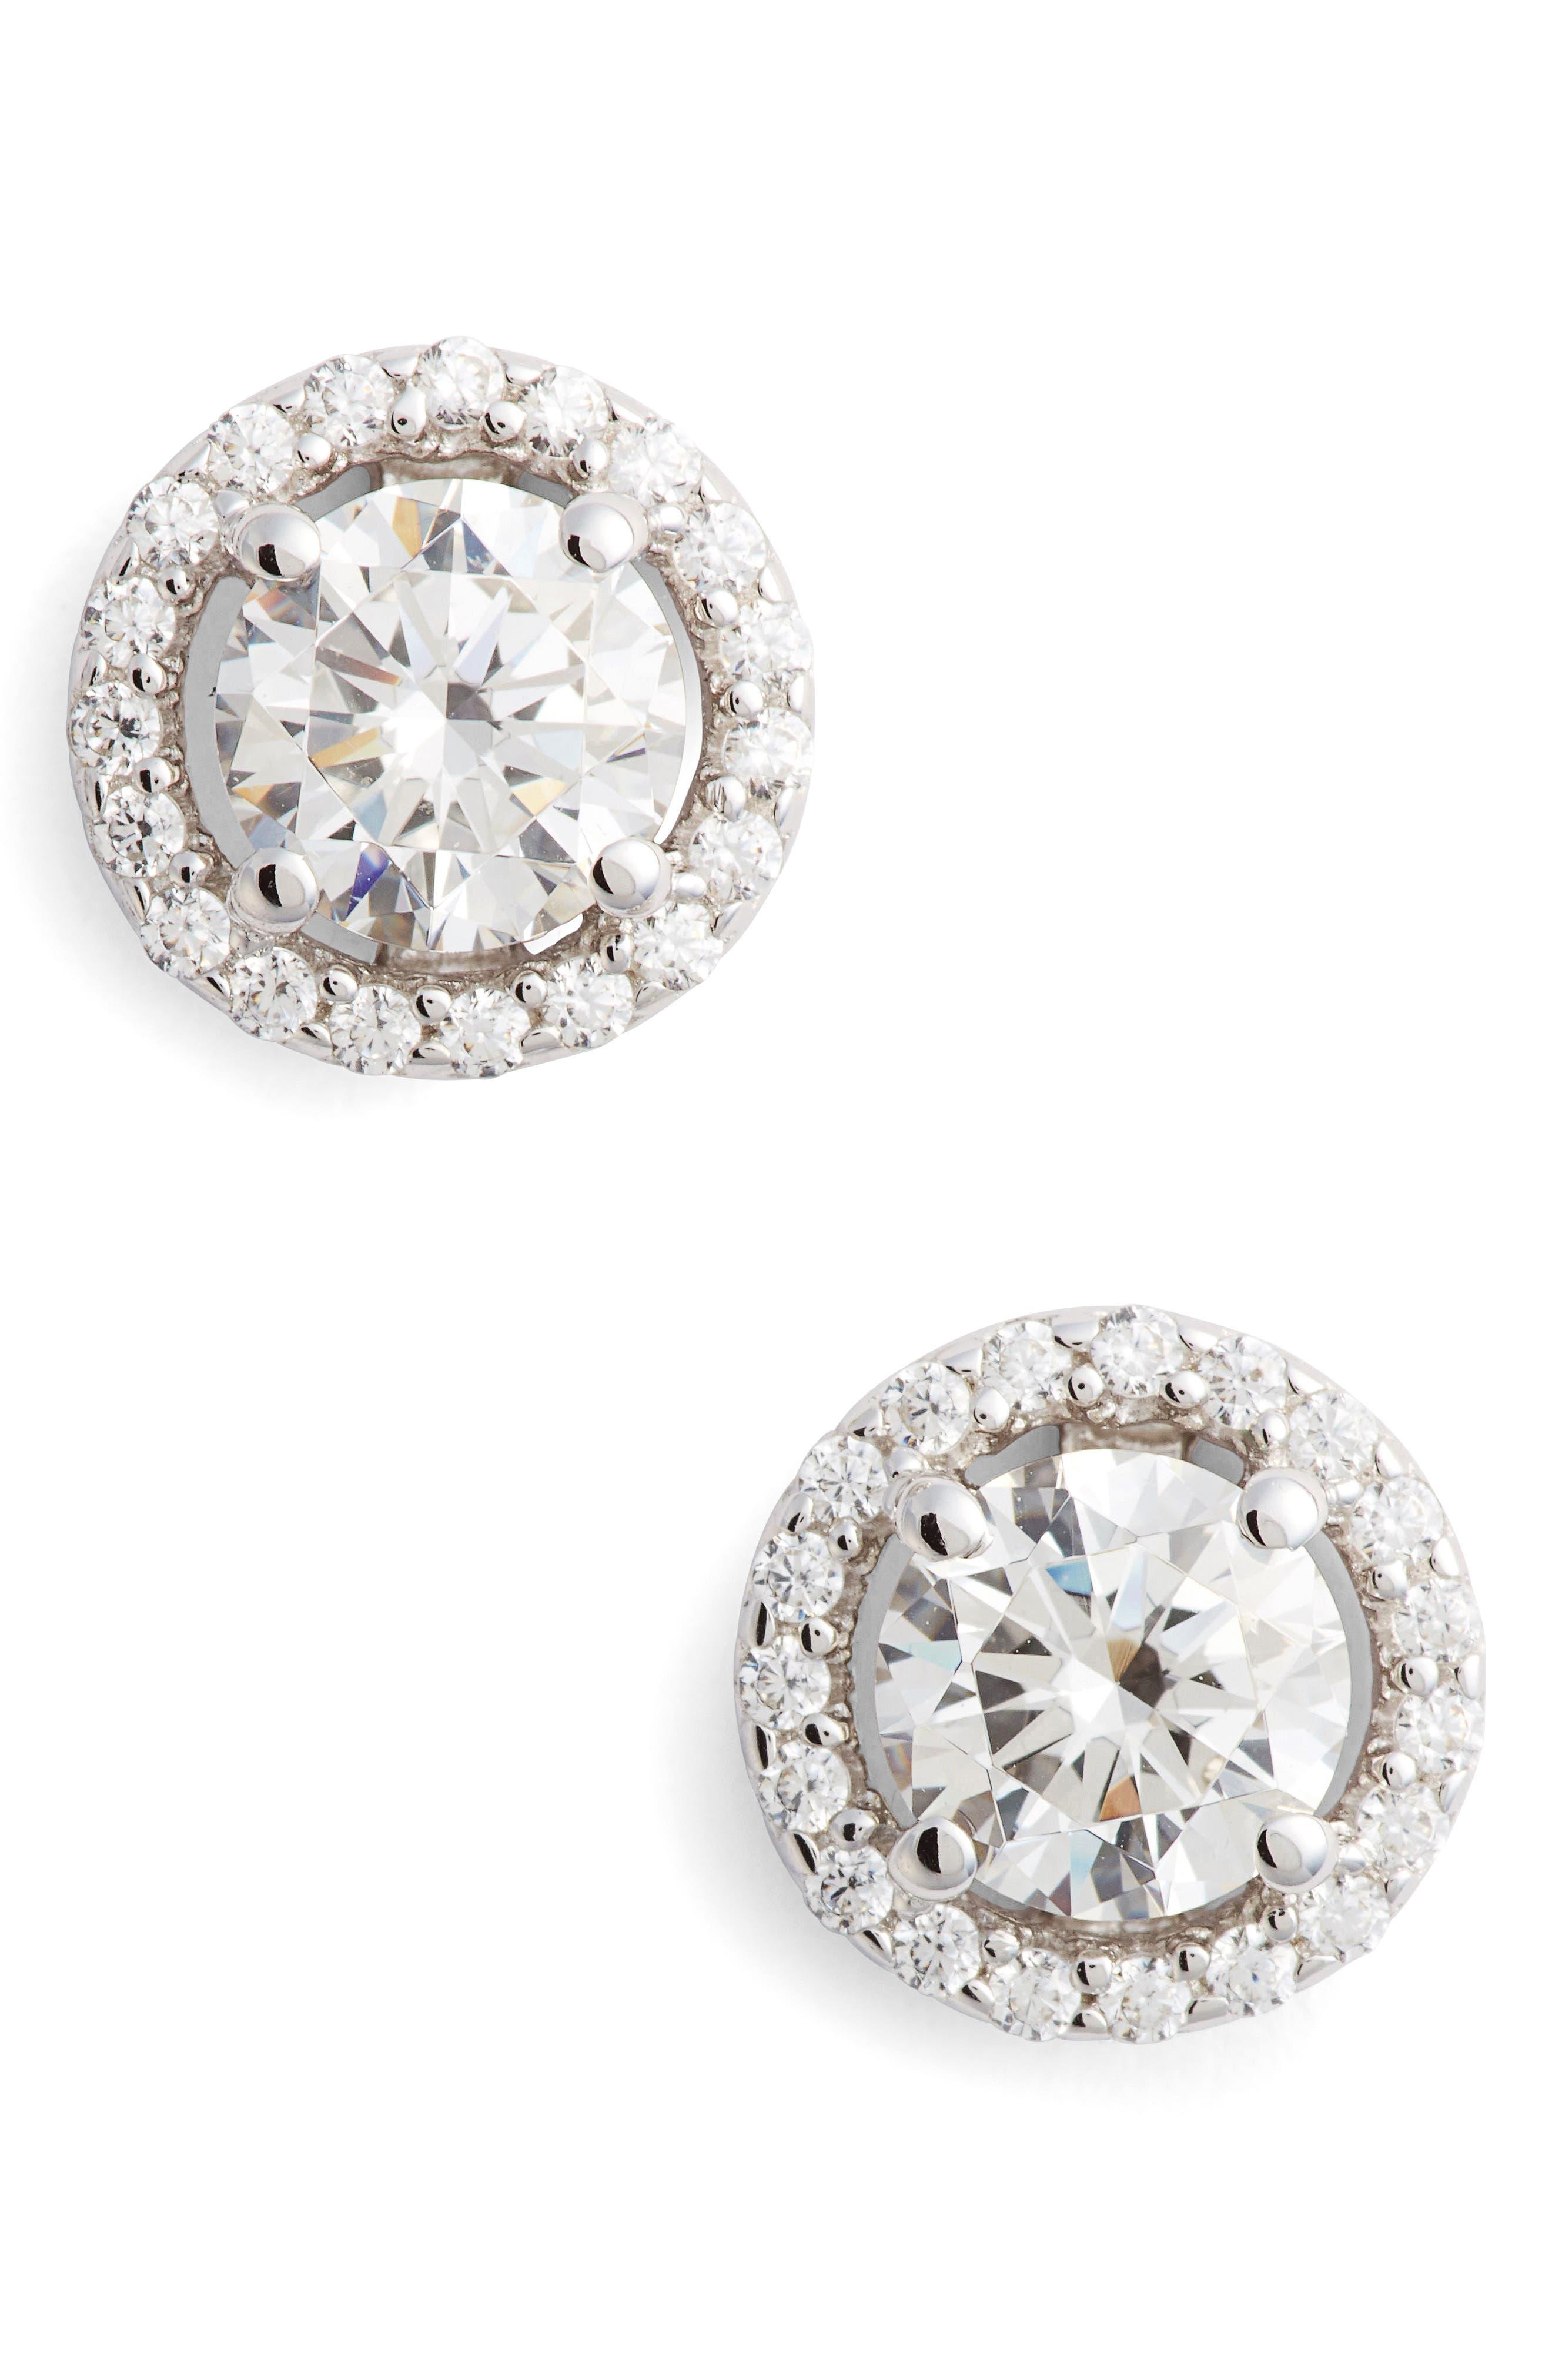 Simulated Diamond Stud Earrings,                         Main,                         color, Silver/ Clear